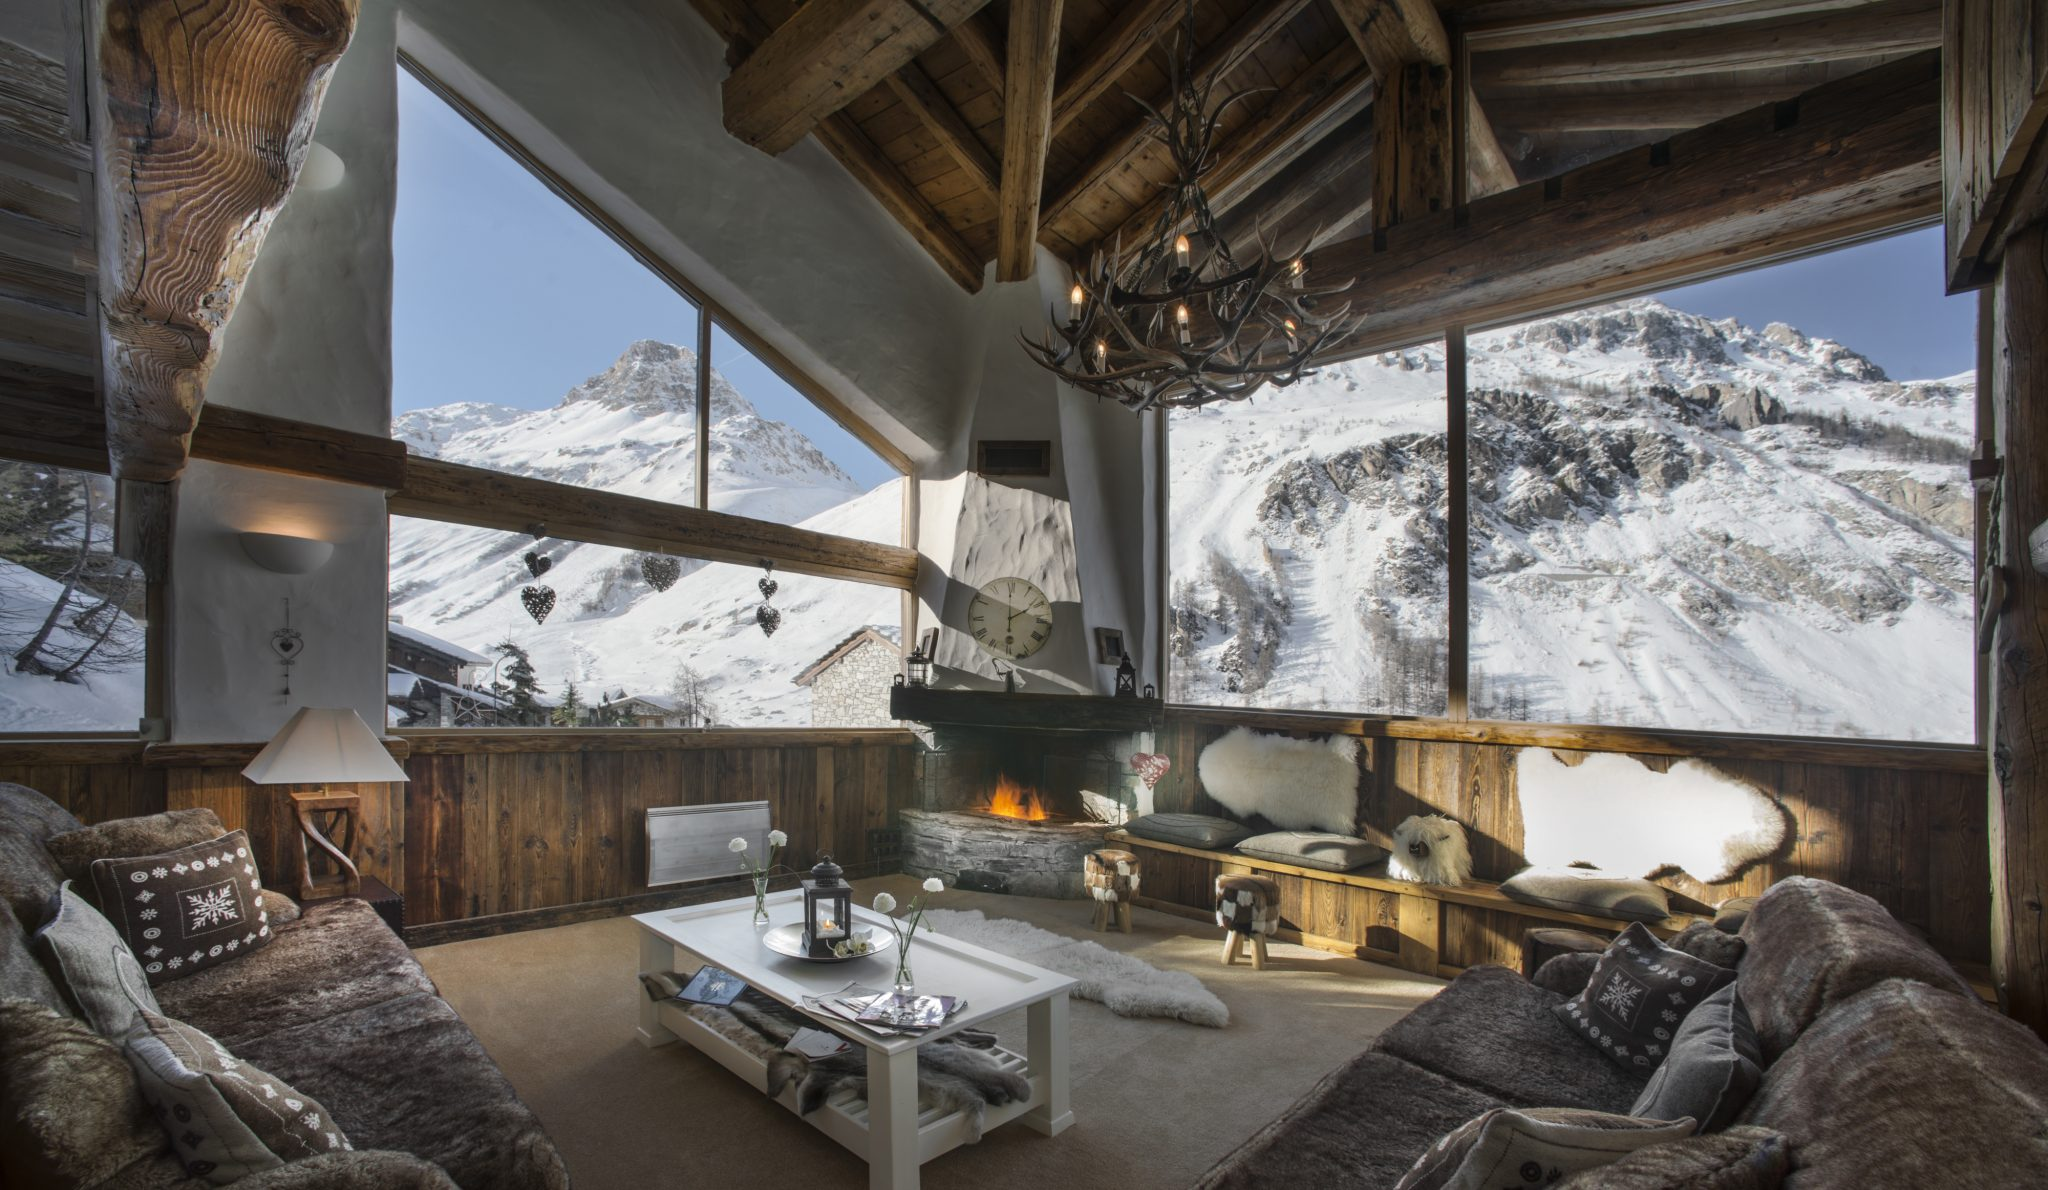 le-kilimanjaro-sitting-room-2